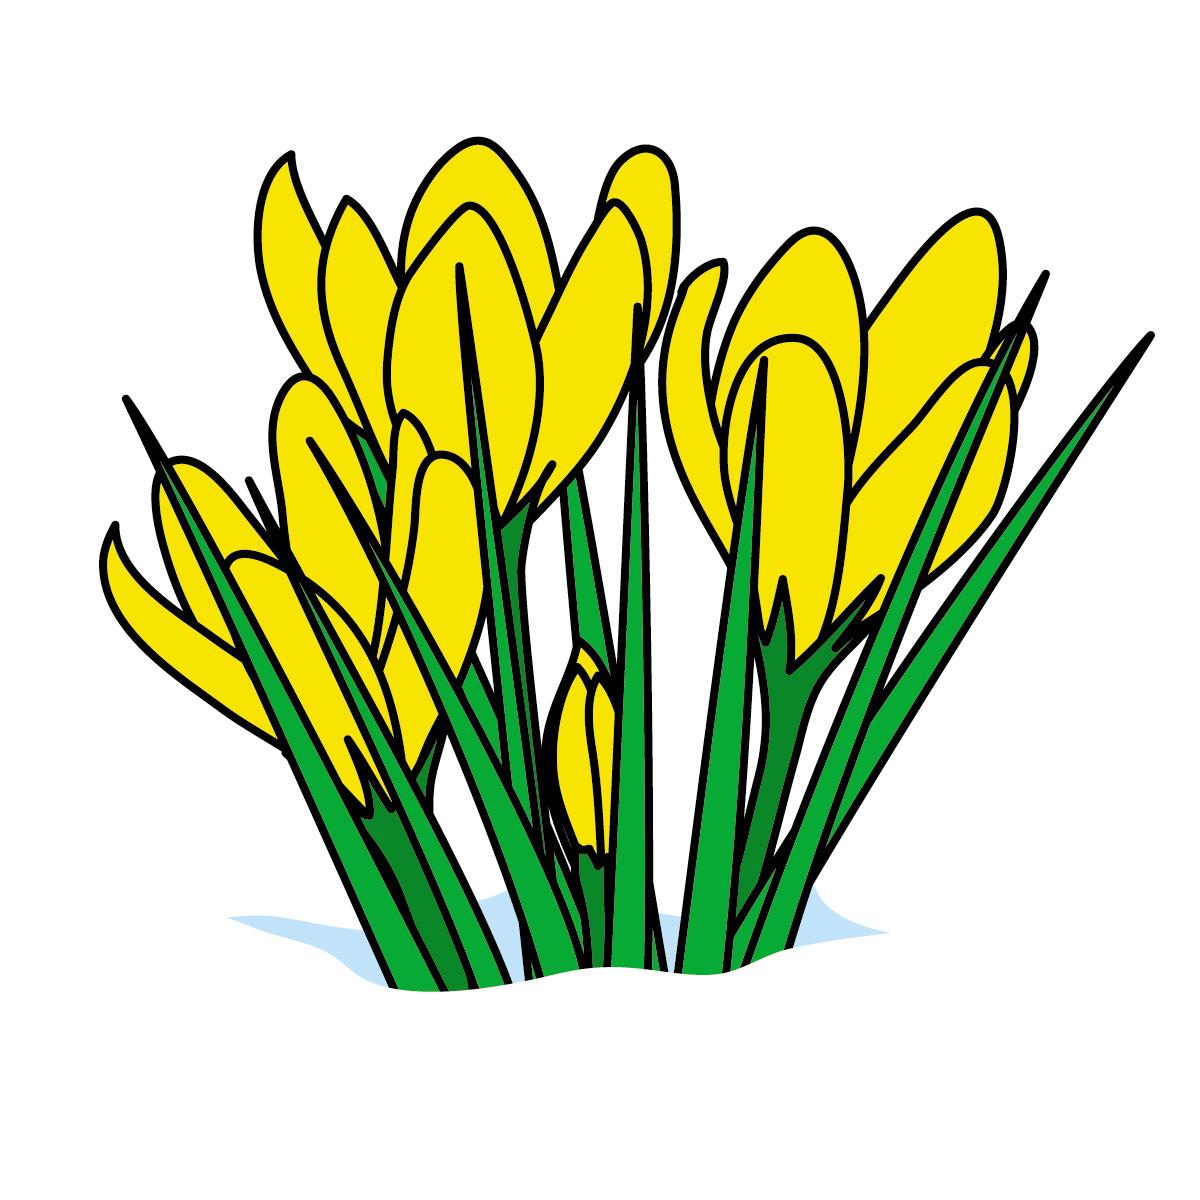 1200x1200 Spring Break Spring Clip Art Free Clipart Images Image